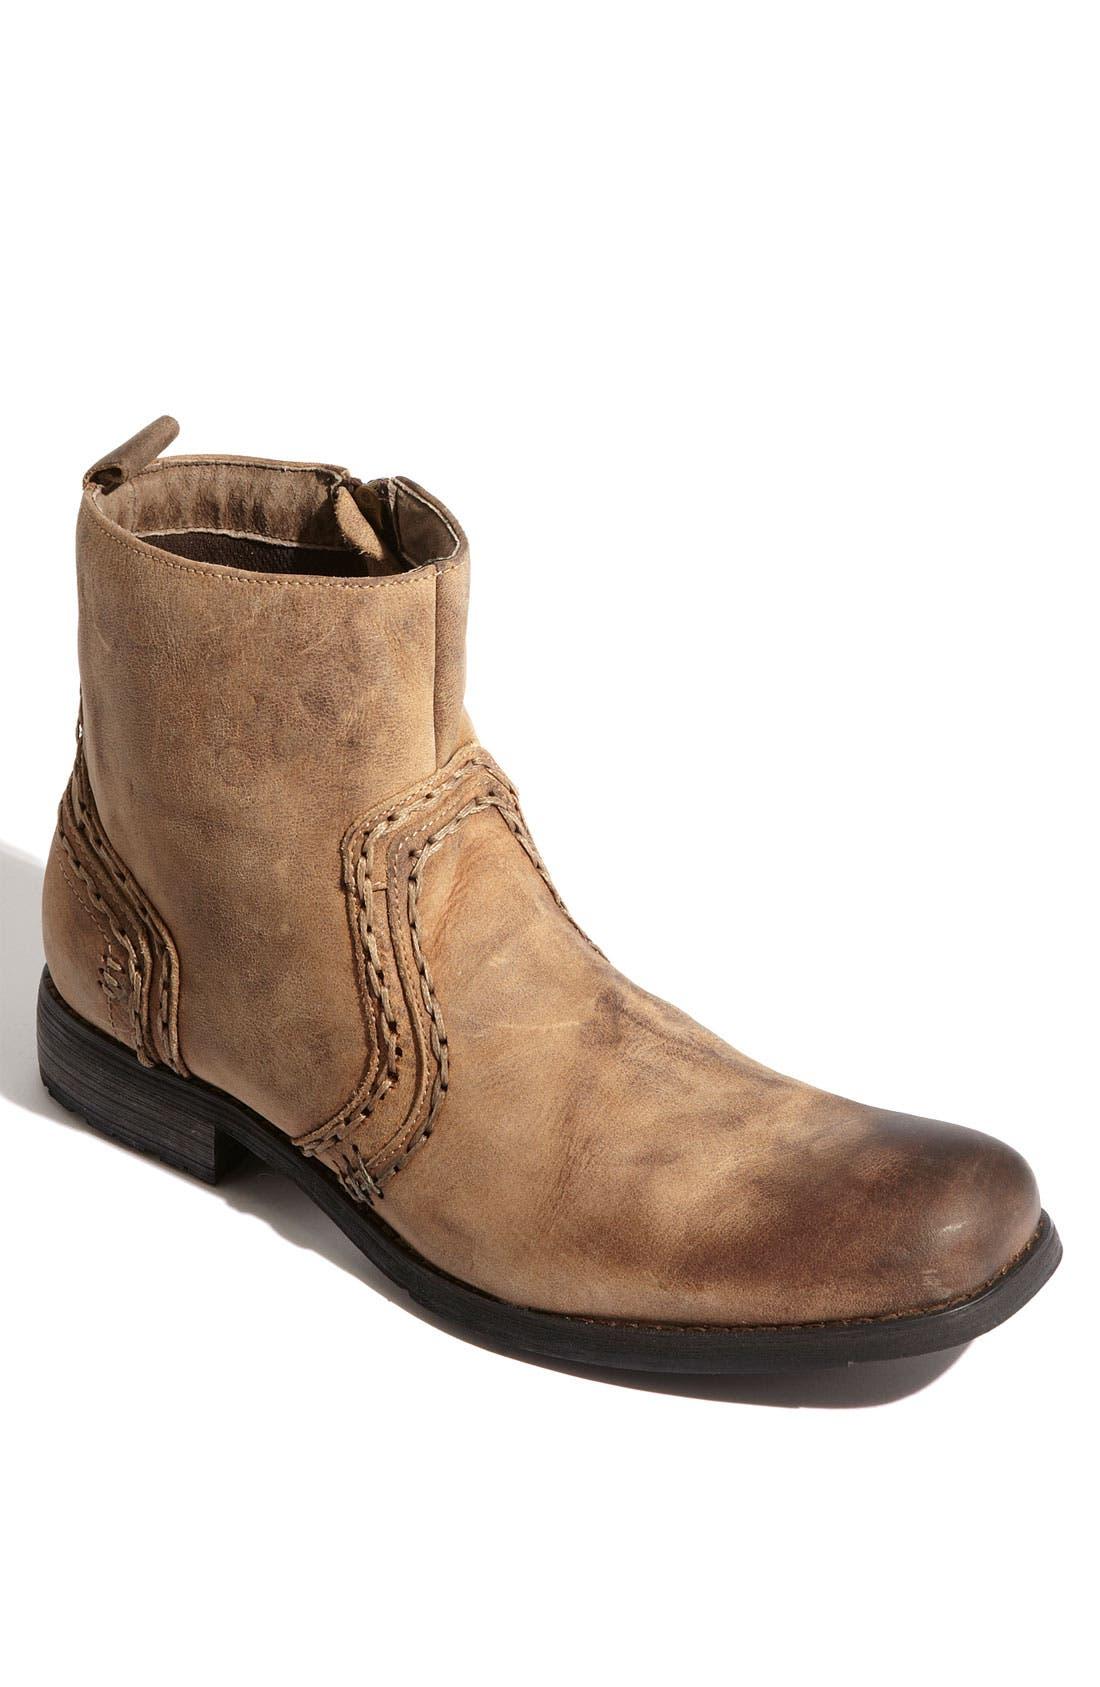 Main Image - Bed Stu 'Revolution' Boot (Men)